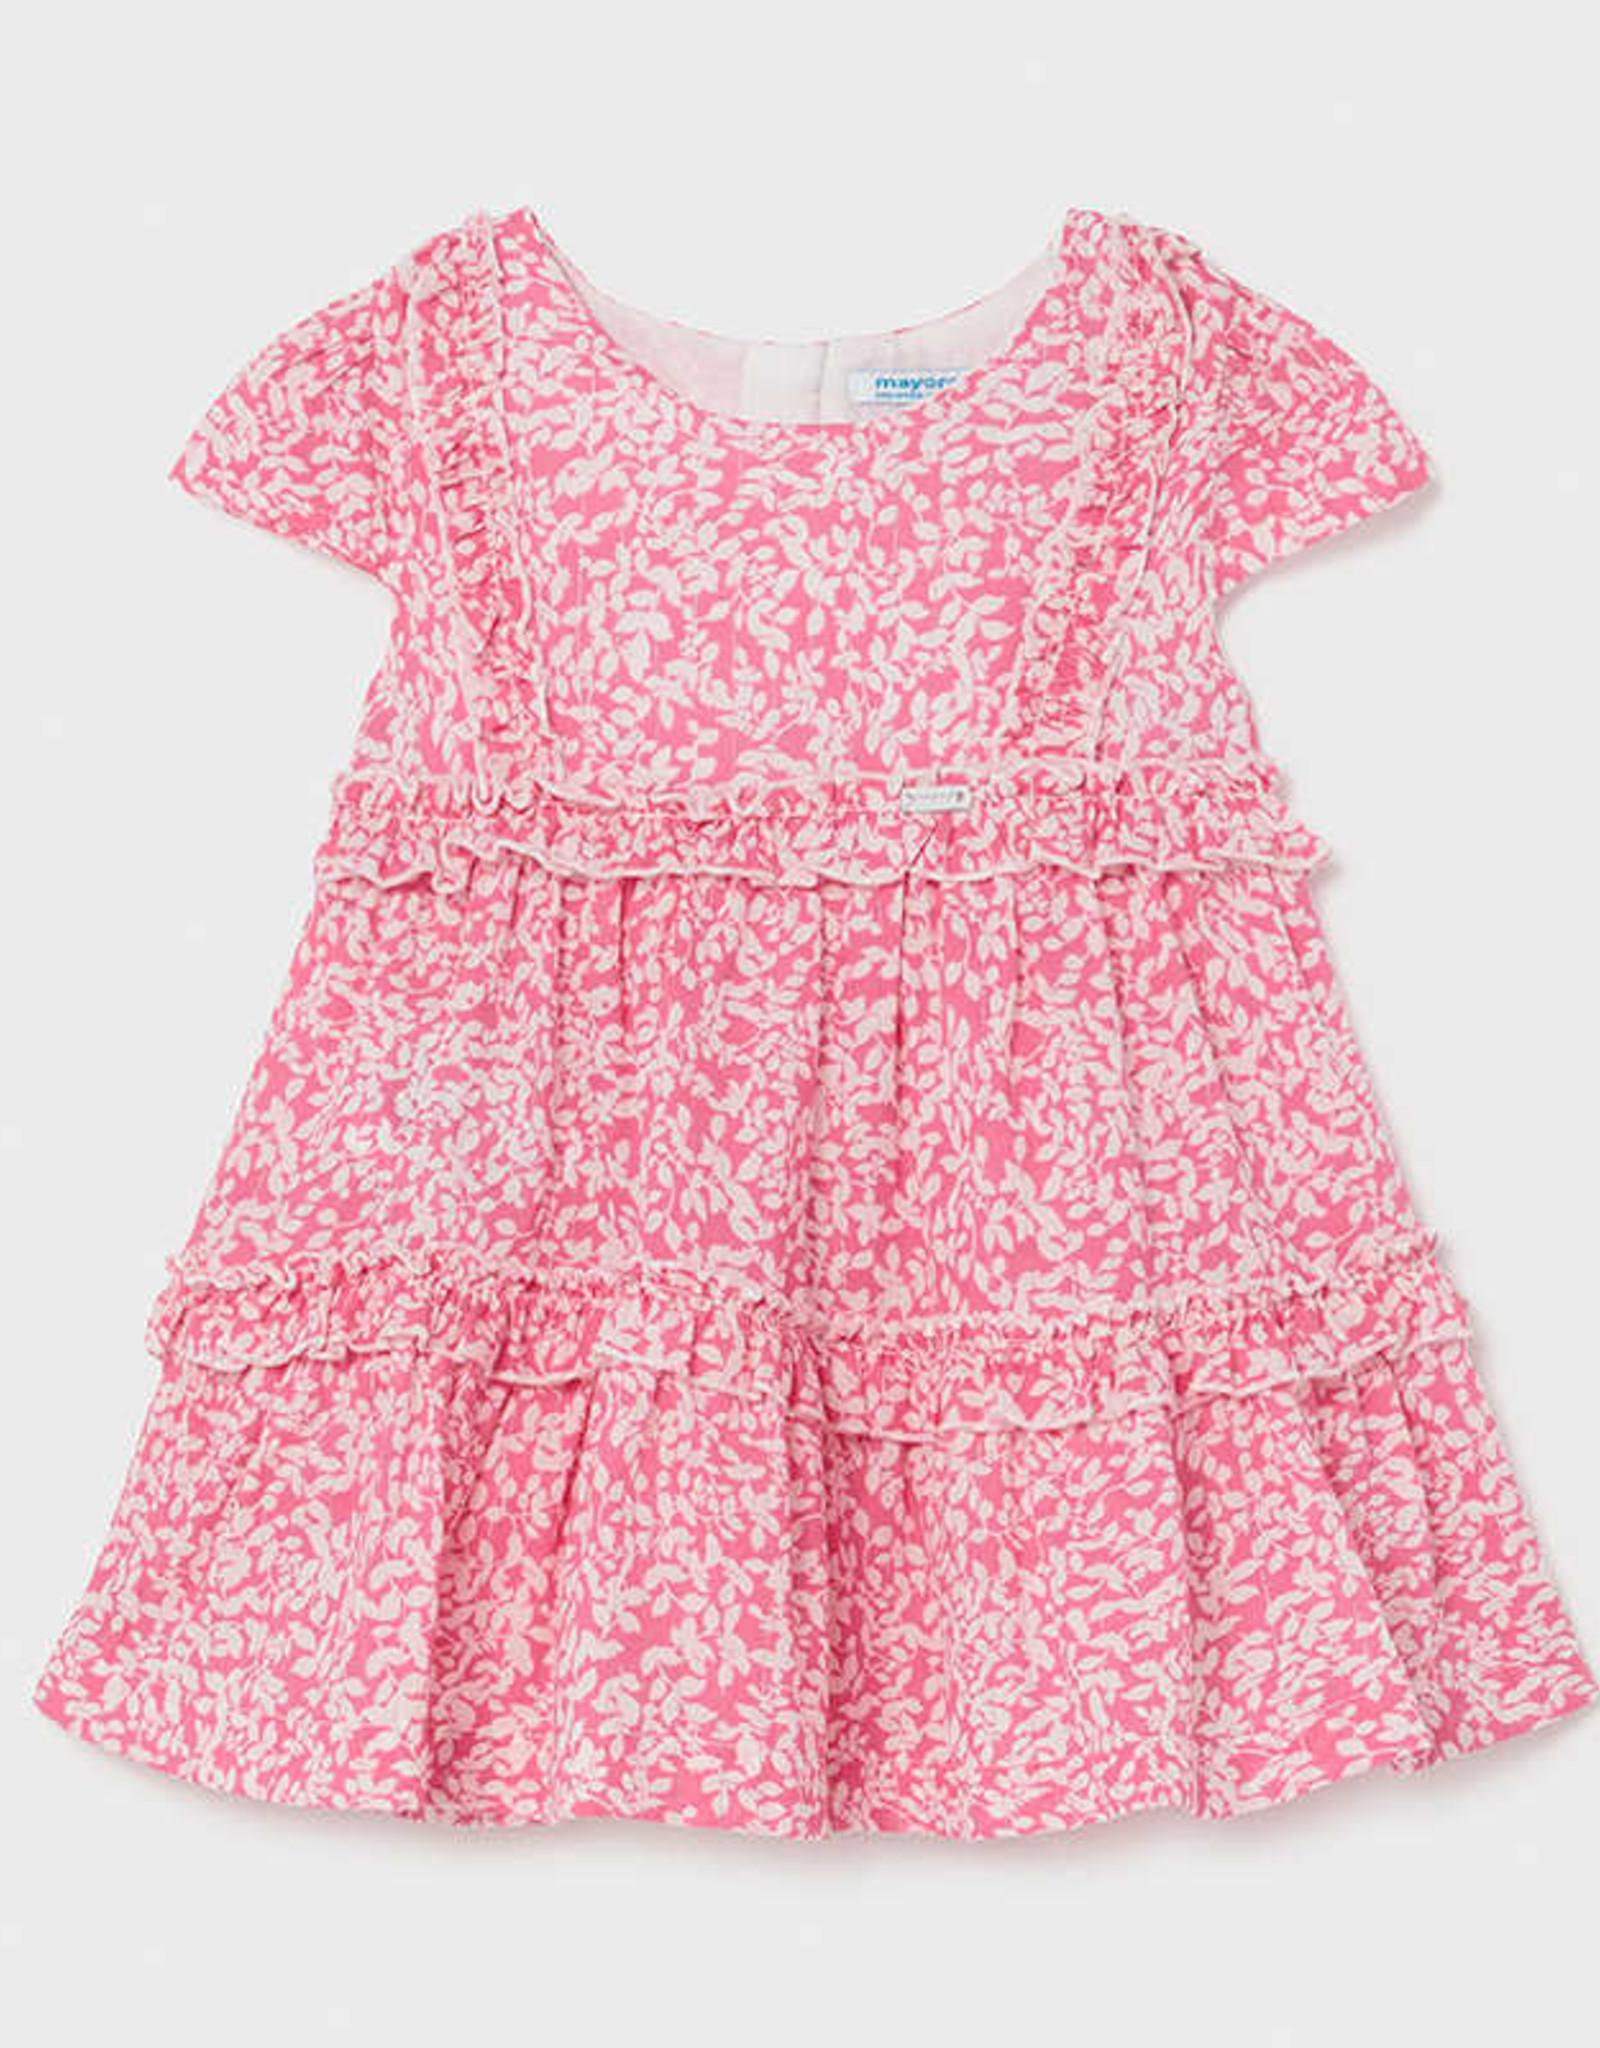 Mayoral Mayoral Baby Girl Floral Print Dress